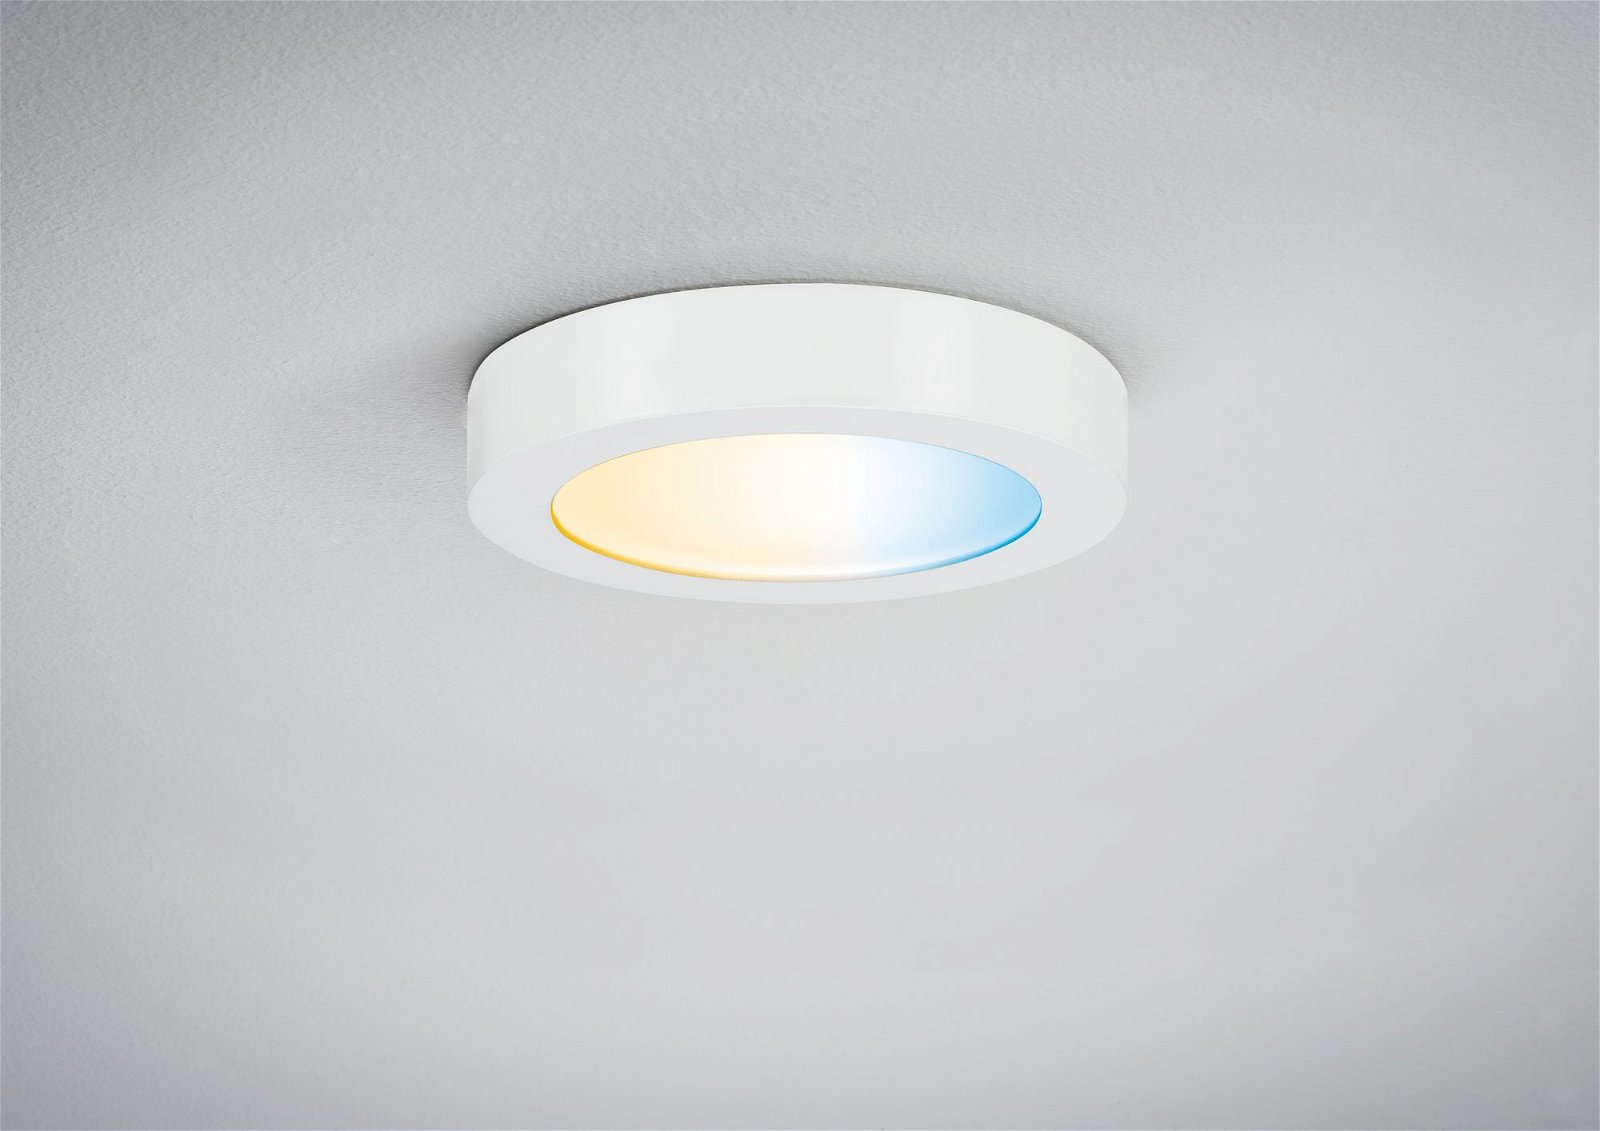 Panneau LED Smart Home Zigbee Cesena rond 170mm 1050lm Tunable White Blanc dépoli